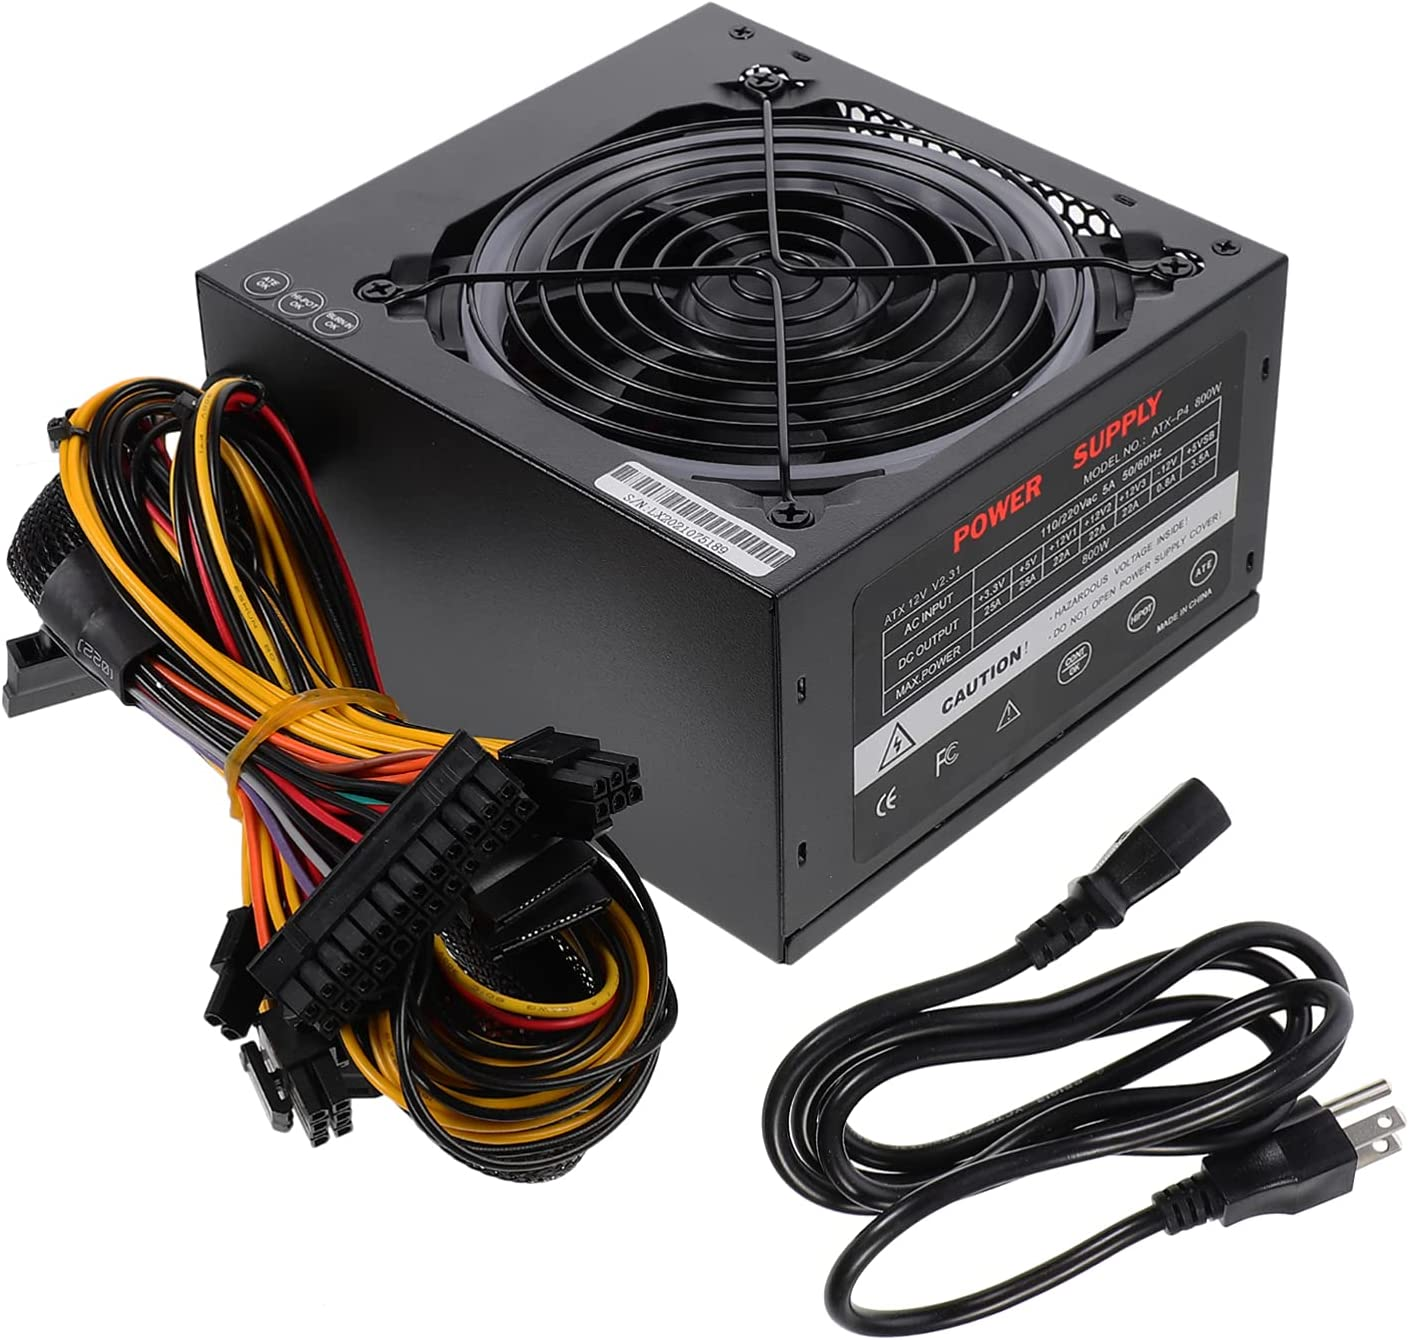 OSALADI Replacement PC Power Source Part Memphis Mall Computer Desktop New sales w 450W